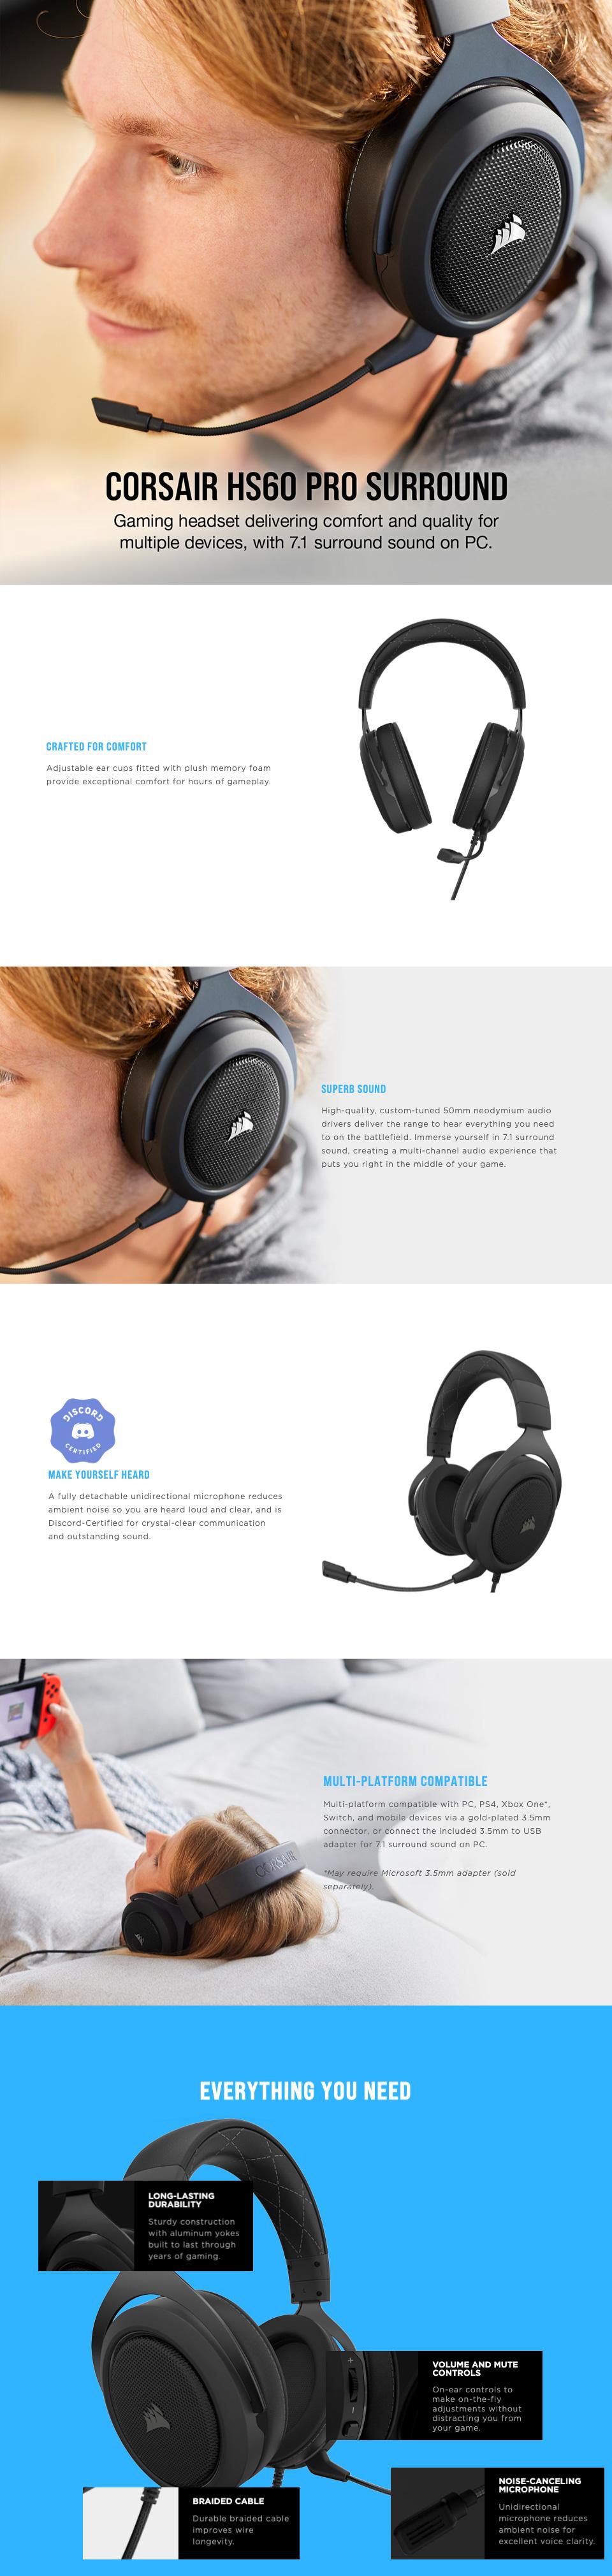 Corsair HS60 PRO Surround Gaming Headset Carbon features